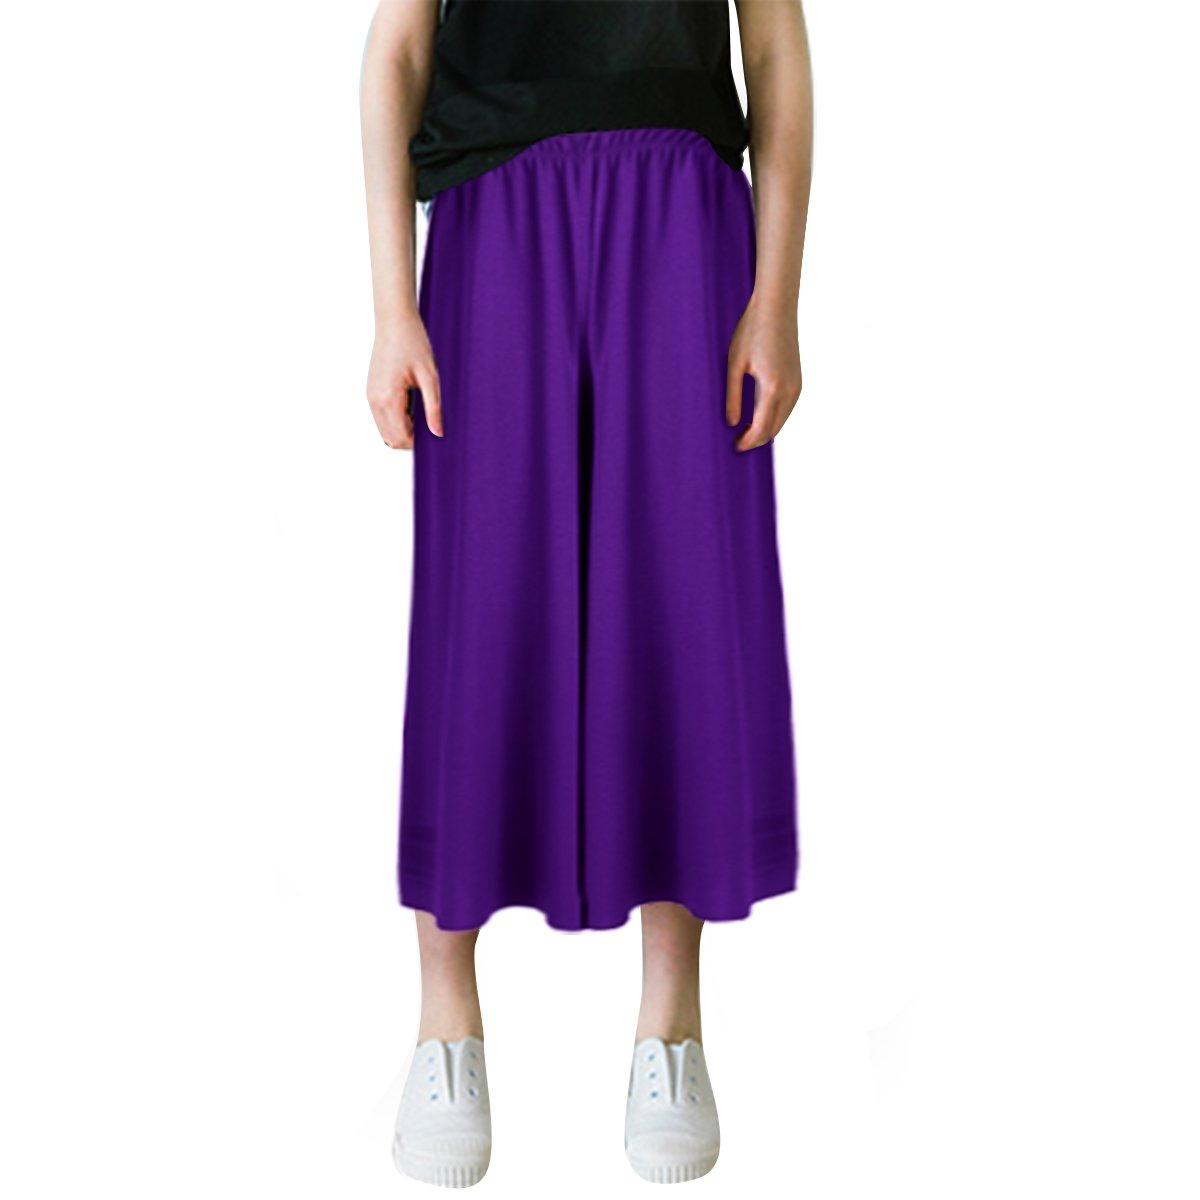 TiaoBug Kids Girls Loose Wide Leg Palazzo Pants Straight Pants Casual Trousers Purple 10-12